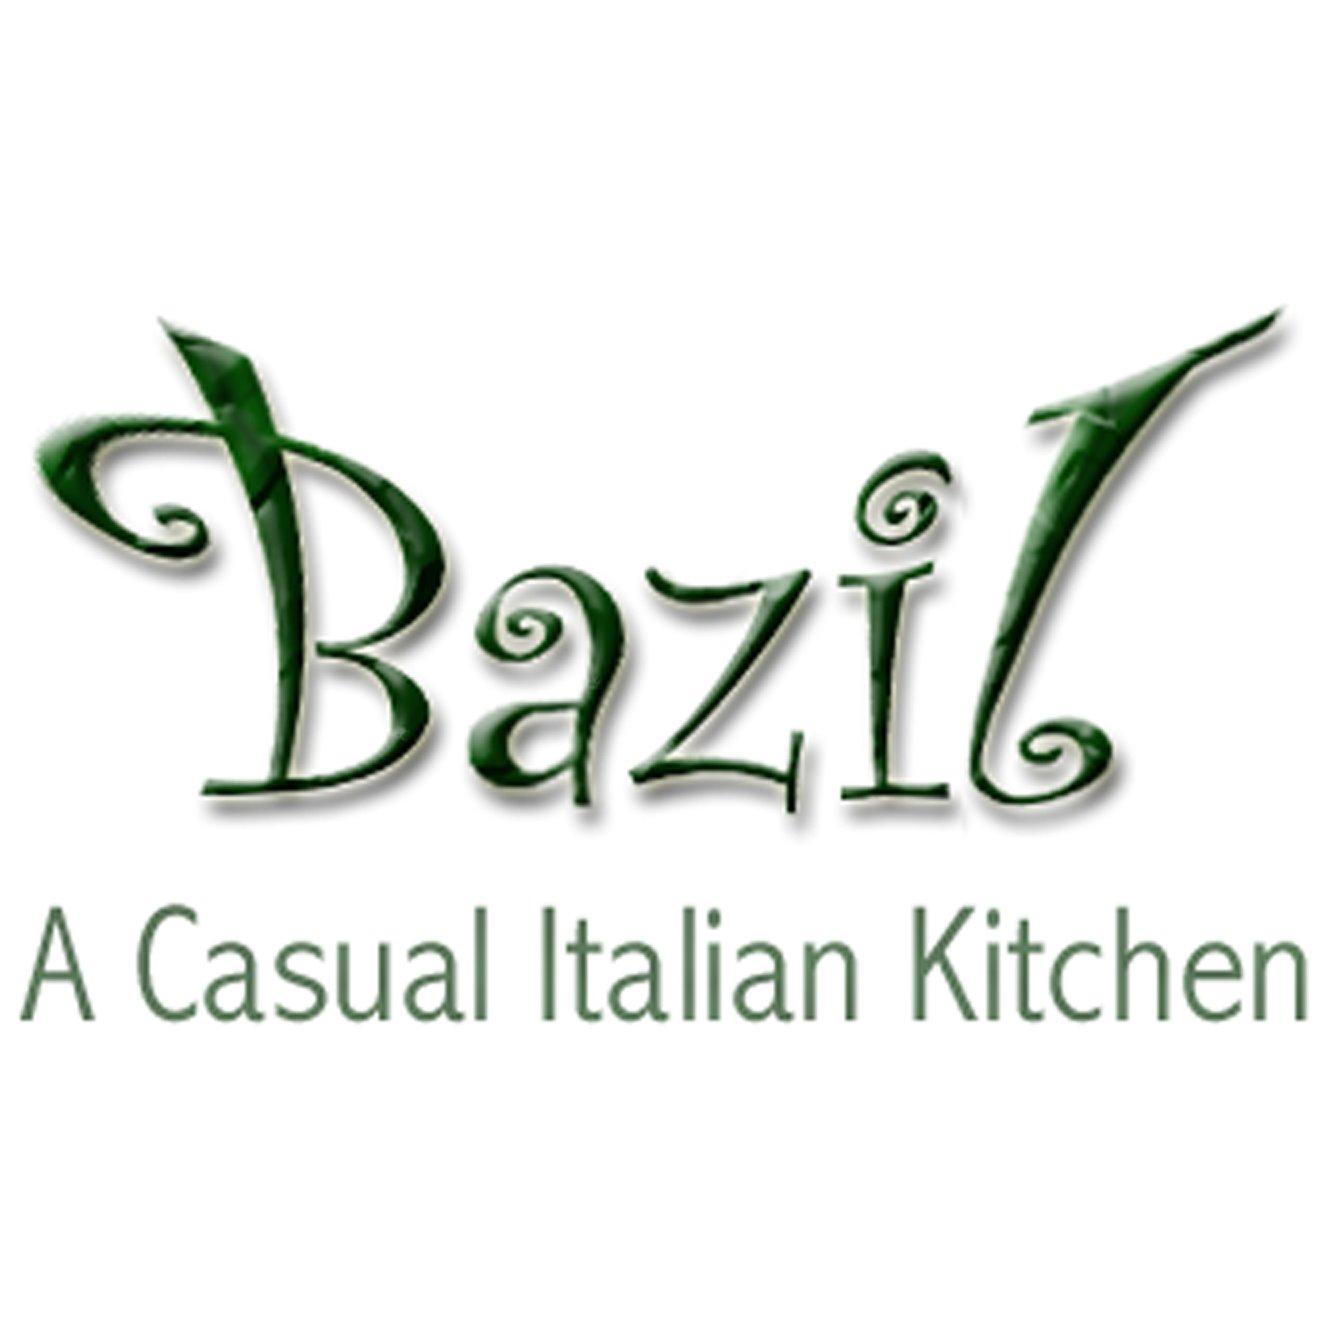 Bazil Restaurant & Catering